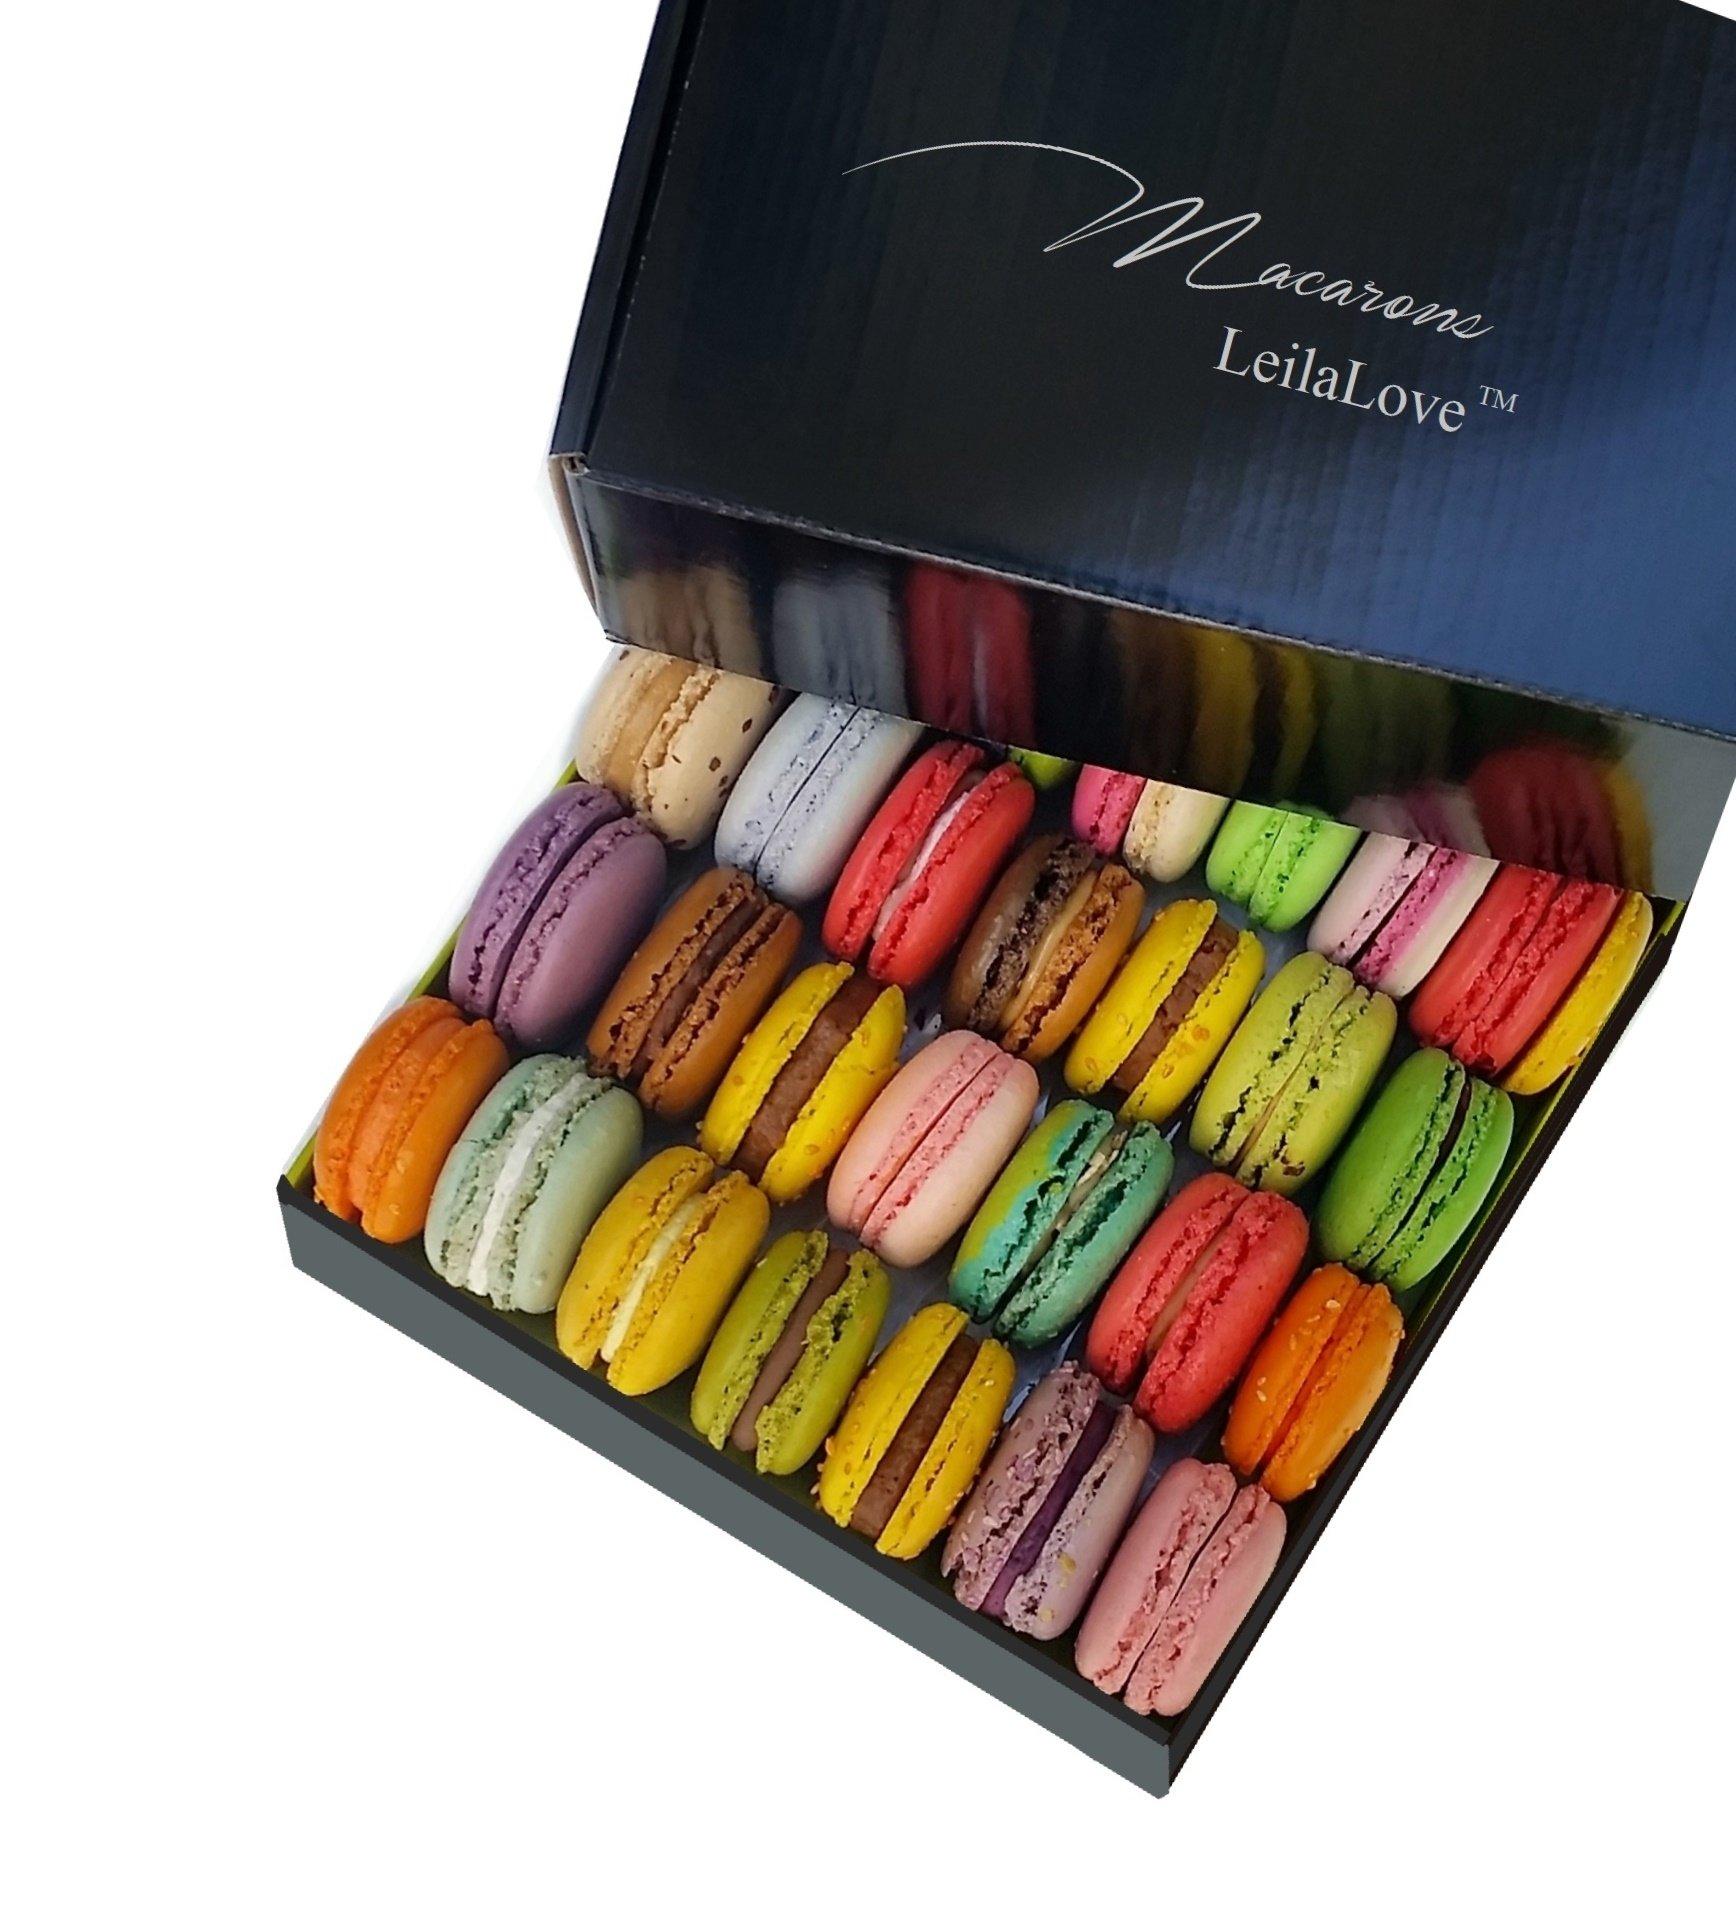 LeilaLove Macarons - 60 Macarons 16 flavors Taste Paris in the Comfort of Home